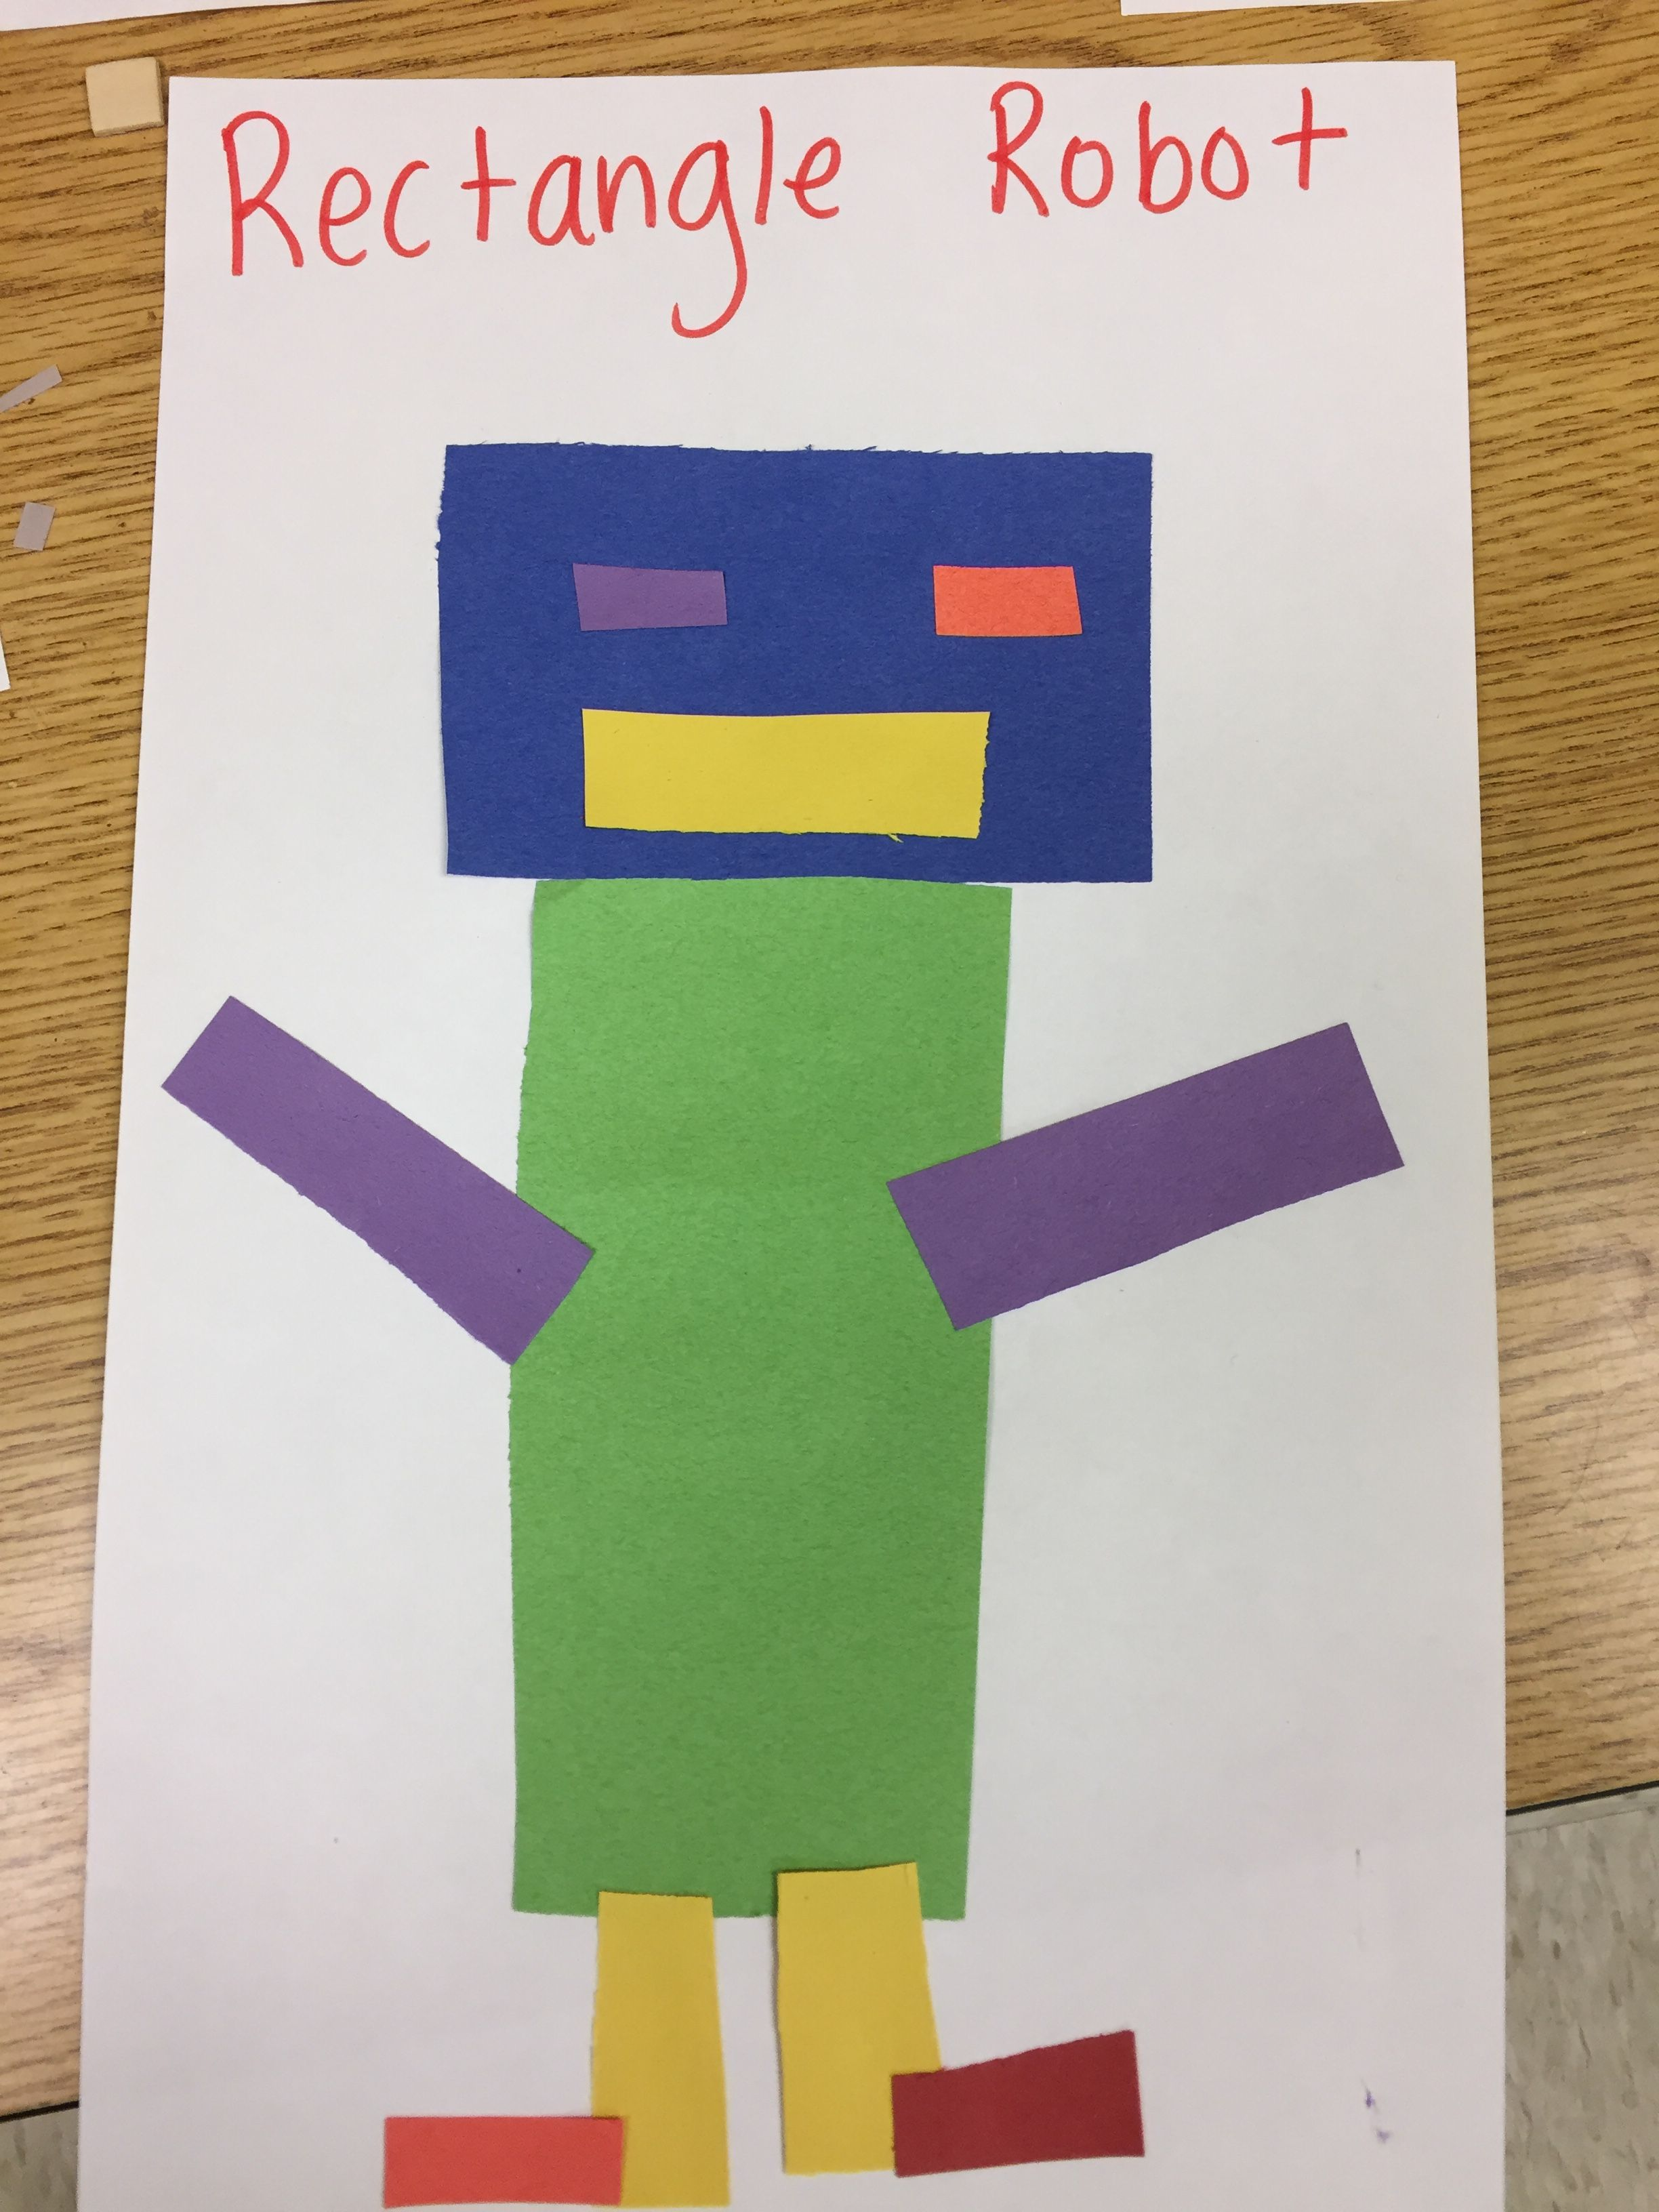 Rectangle Robot Shapes Preschool Crafts Shapes Preschool Art Activities For Toddlers [ 3264 x 2448 Pixel ]